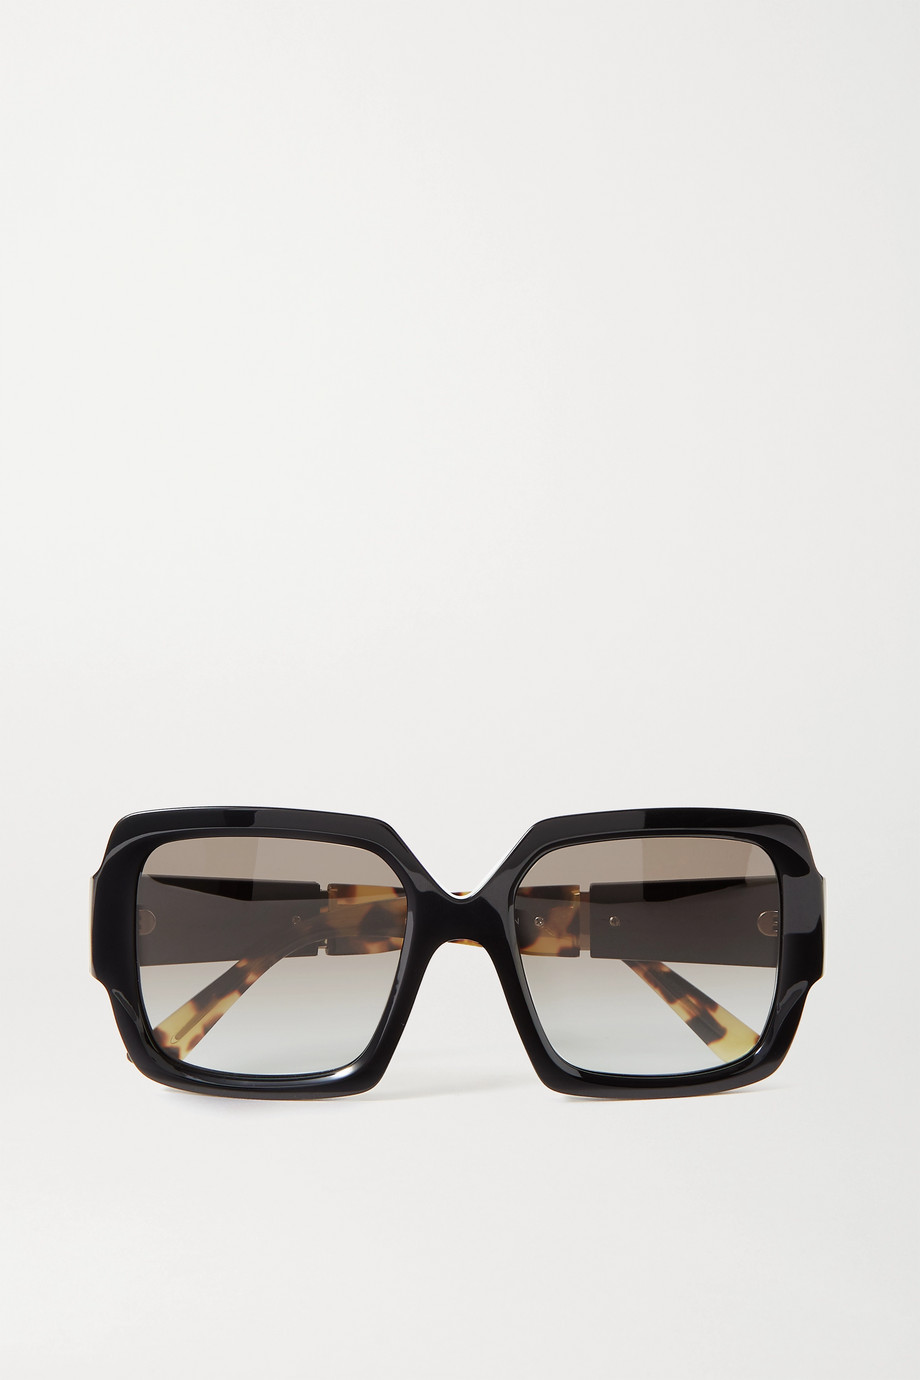 Prada Eyewear Square-frame acetate sunglasses